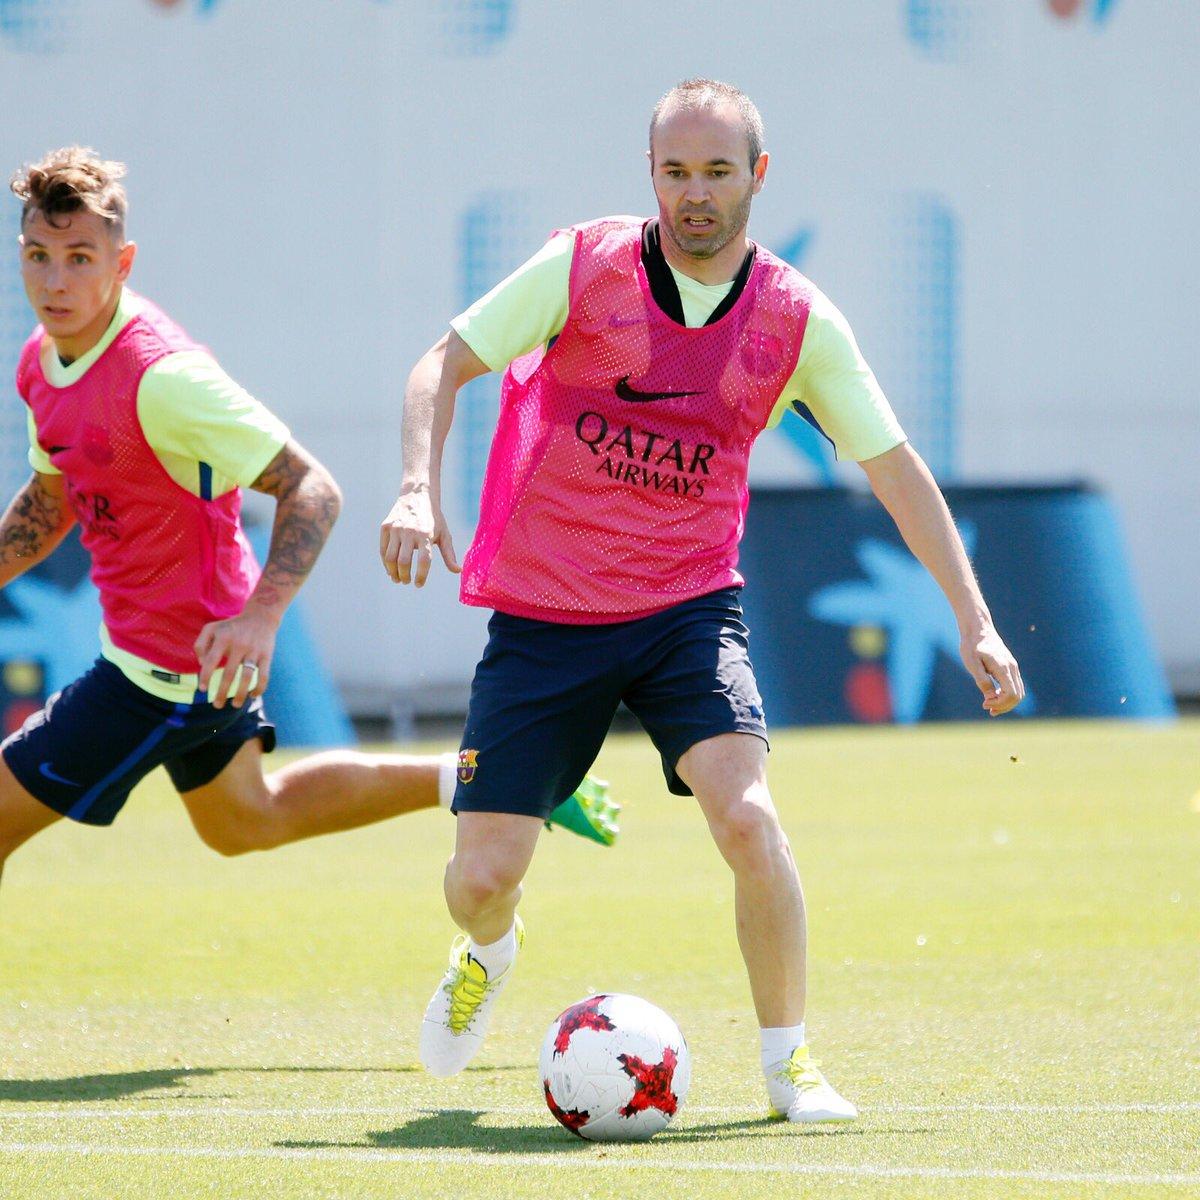 Preparando último partido de la temporada! Buenas sensaciones! Força Barça!!